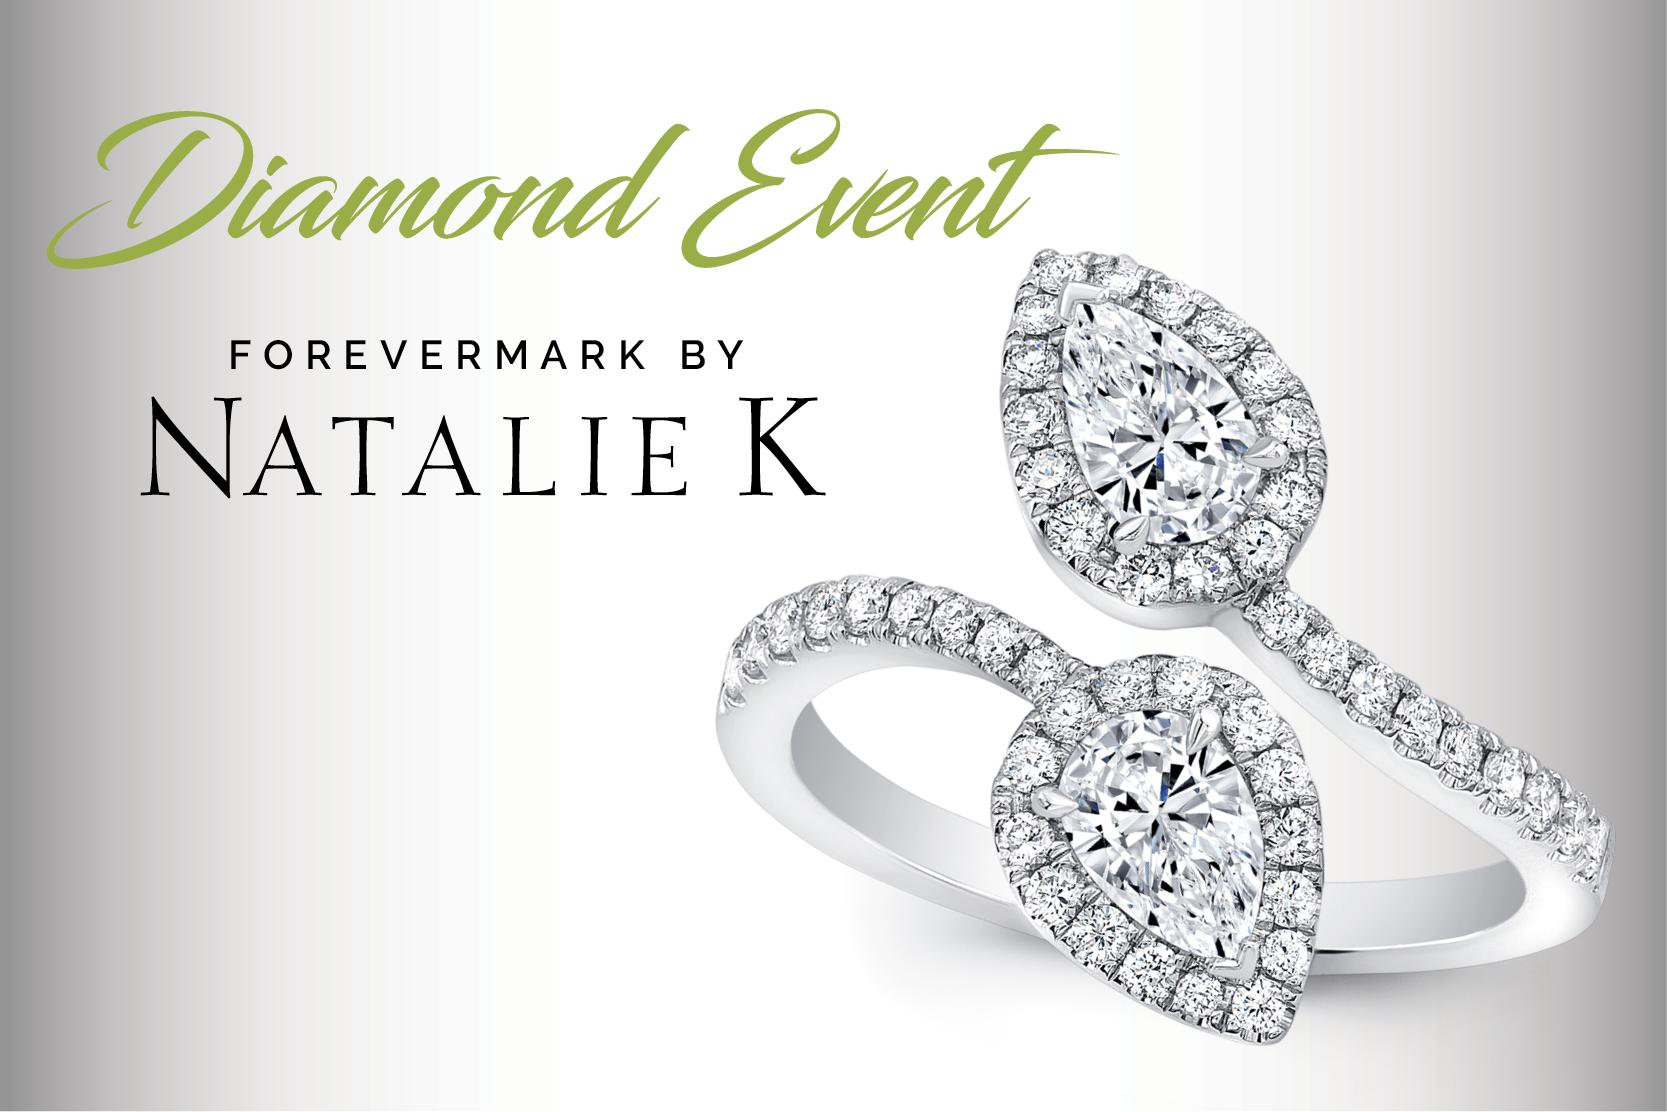 Natalie K Diamond Event